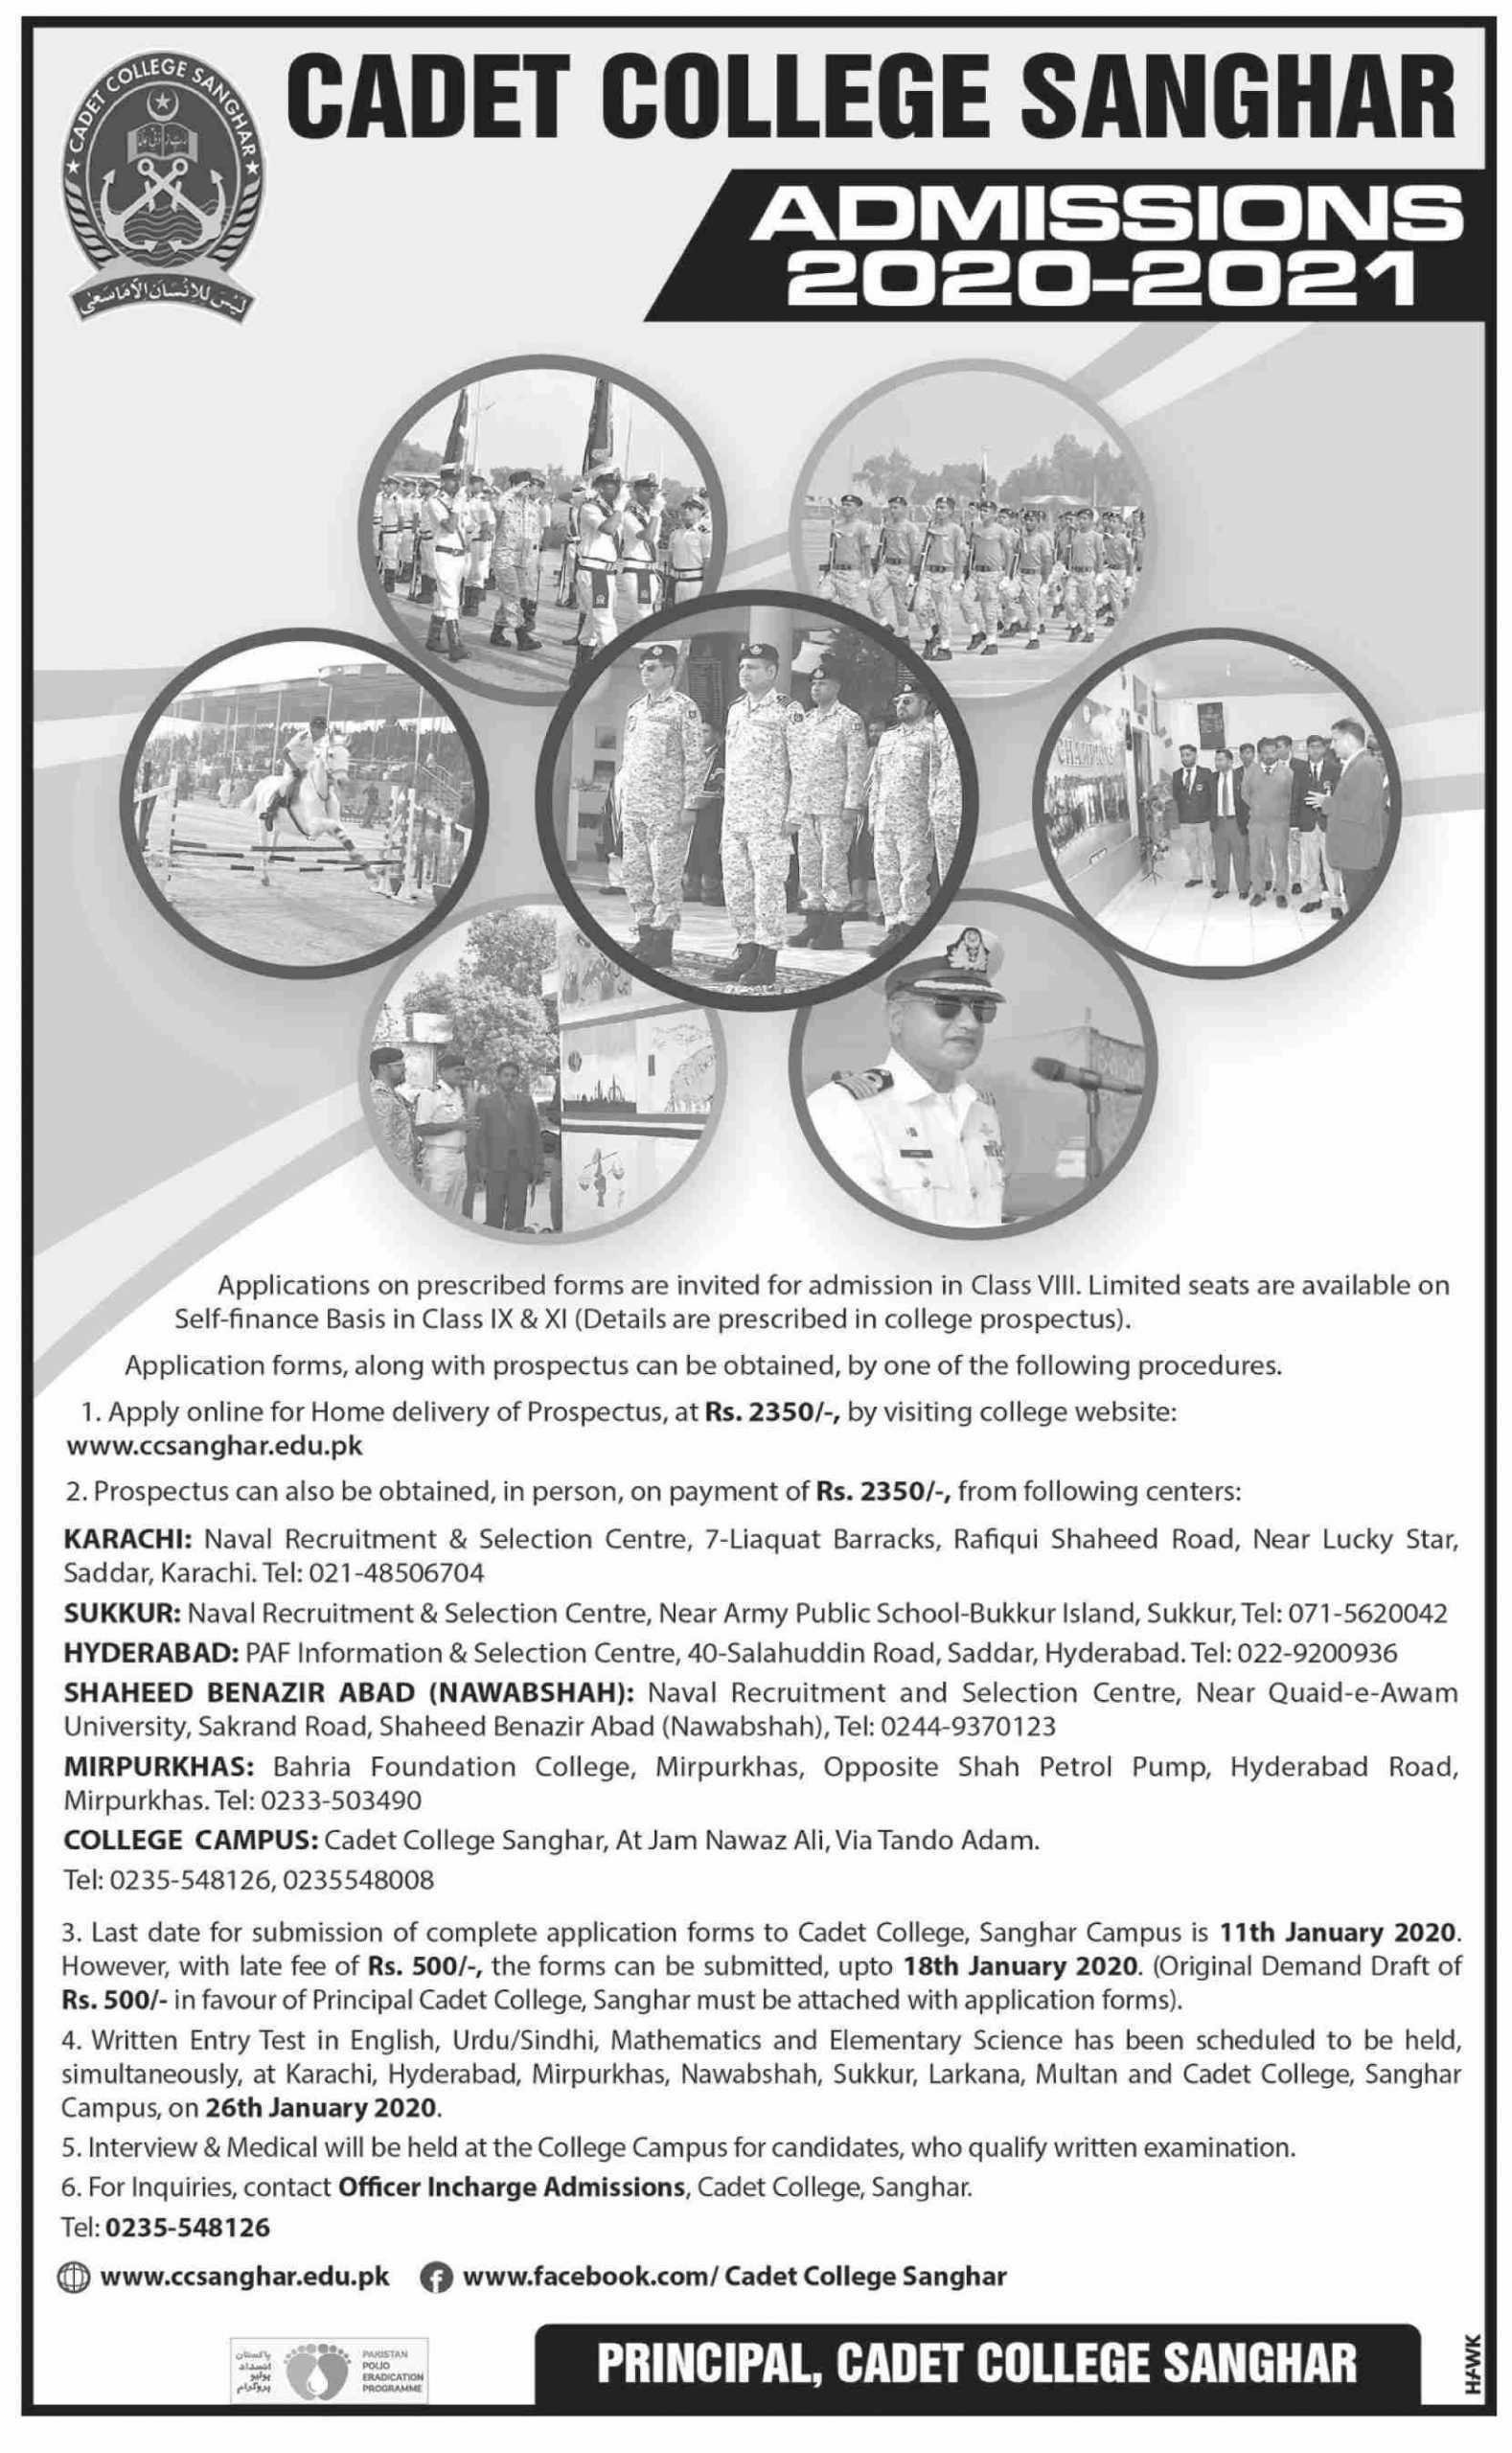 Cadet College Sanghar Admission 2020-21 8th Class